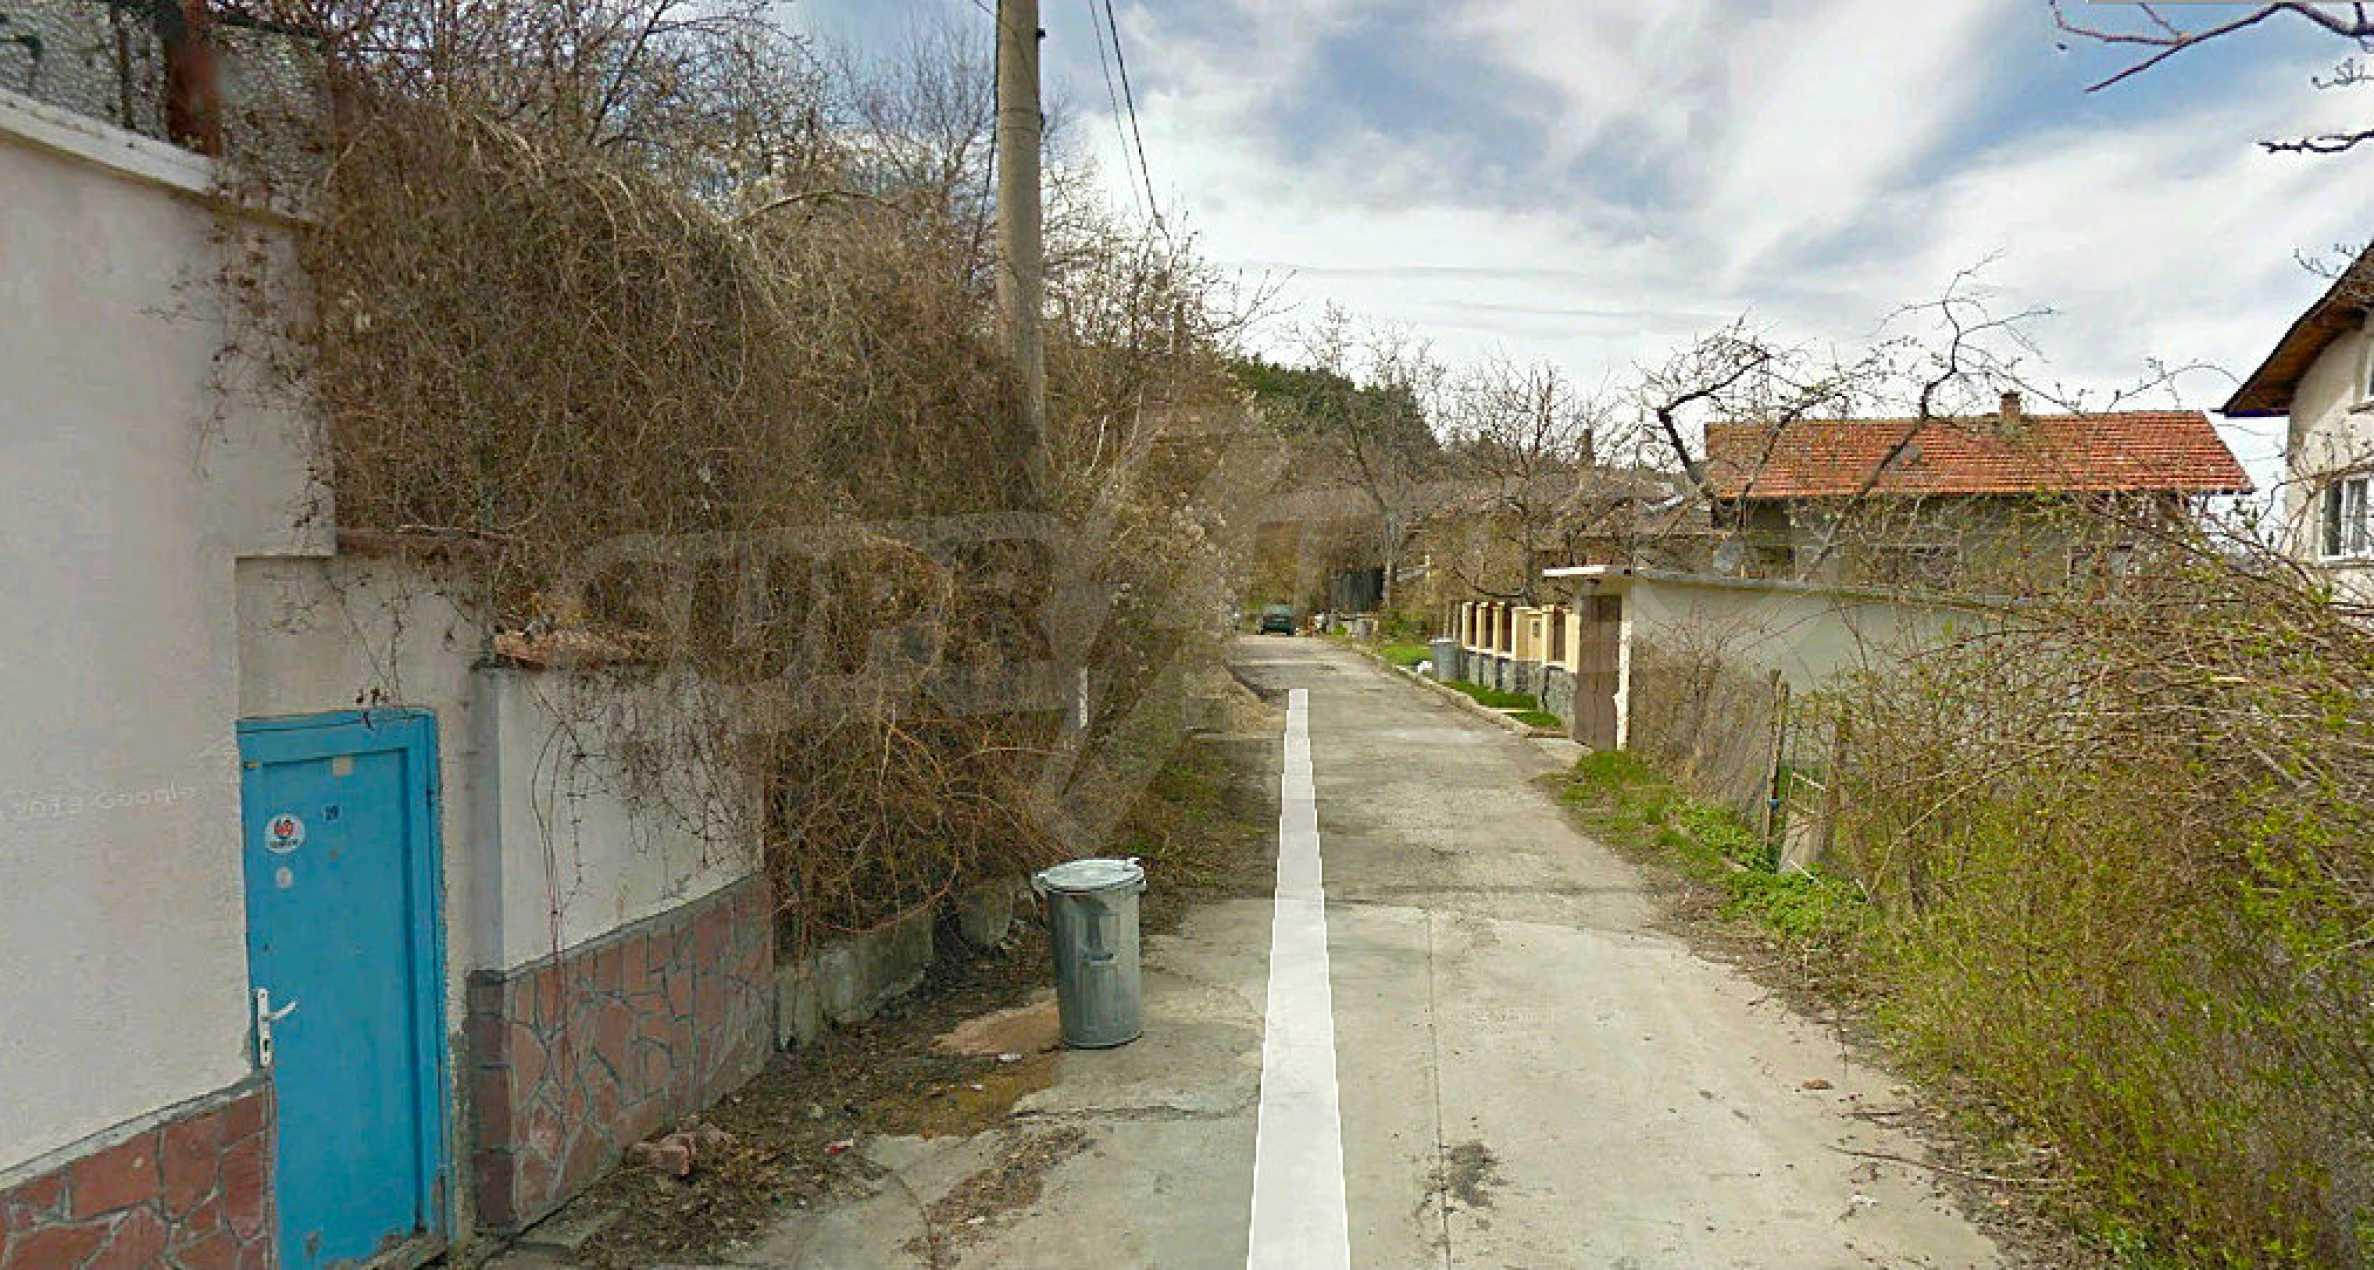 Baugrundstück zu verkaufen im Stadtteil Gradoman 5